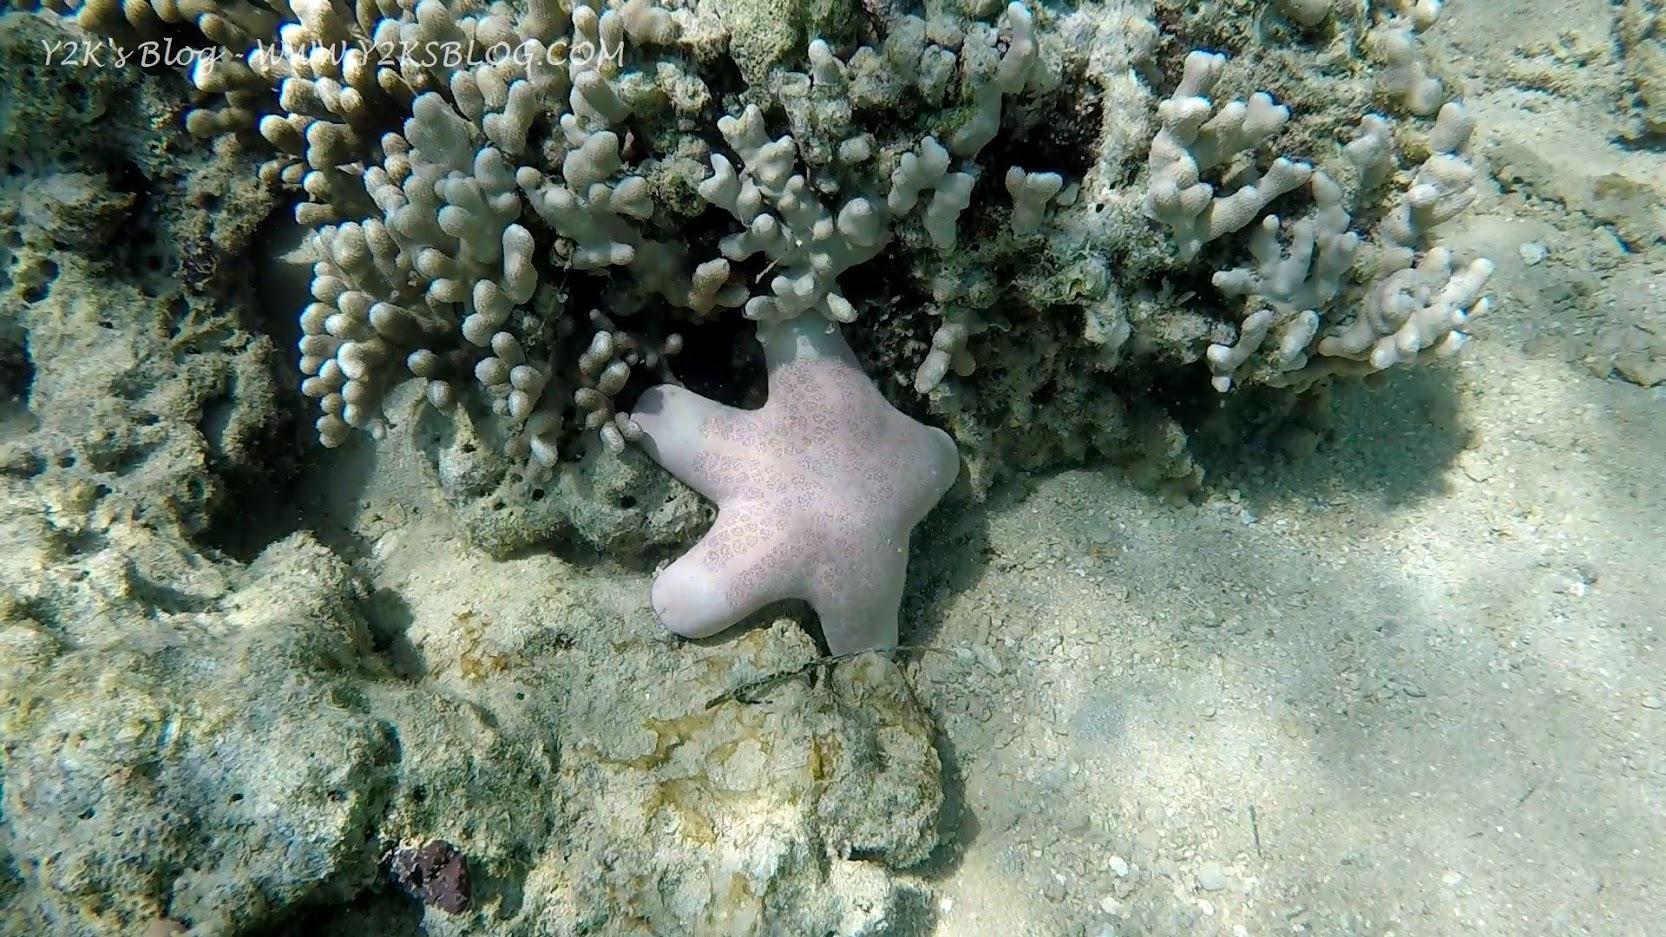 La stella marina rosa puffosa cicciottosa - Port Maurelle